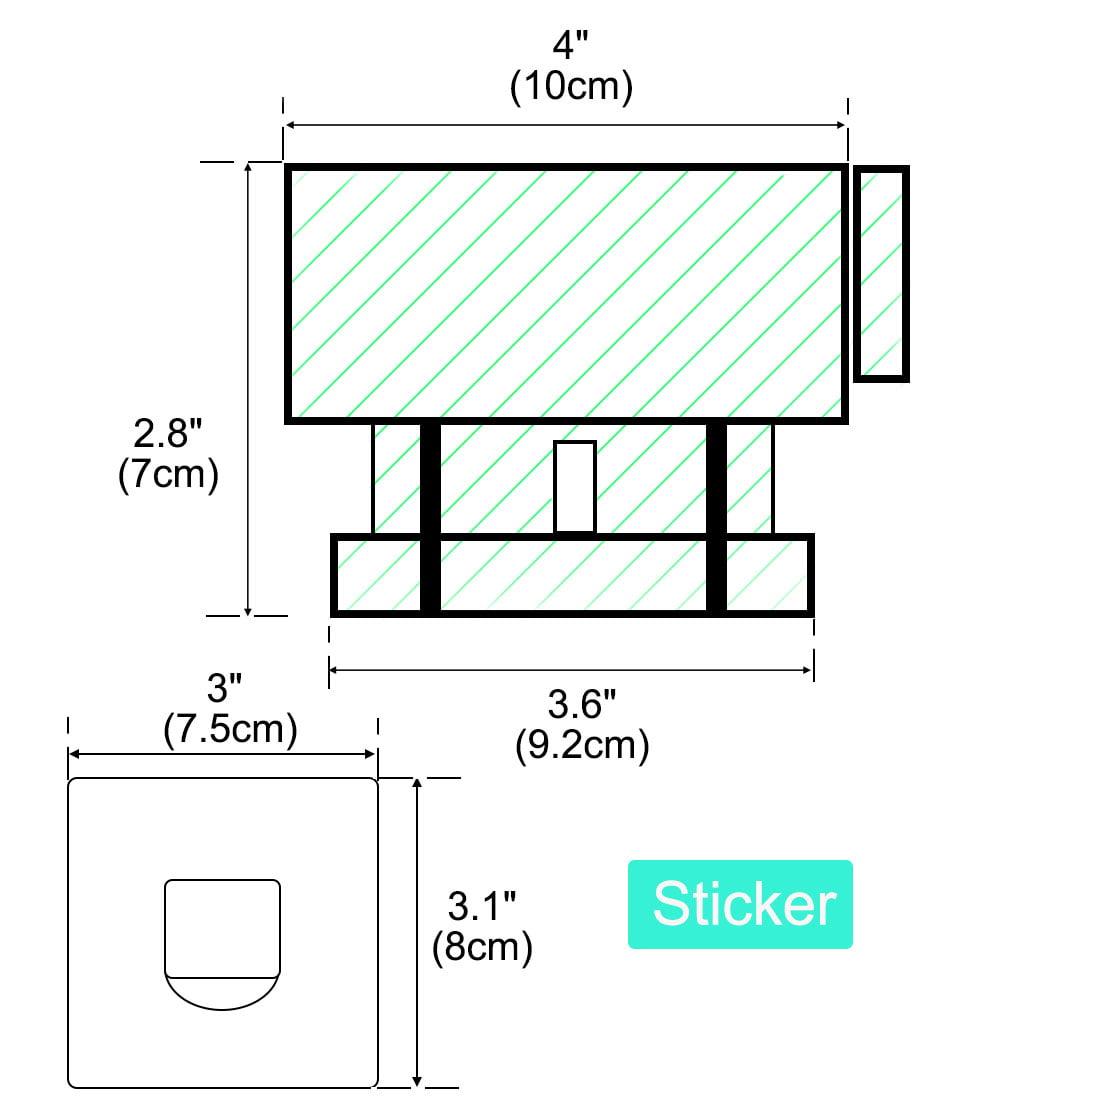 Self Adhesive Plastic Hair Dryer Holder Blower Rack Organizer Bathroom Green - image 1 de 7